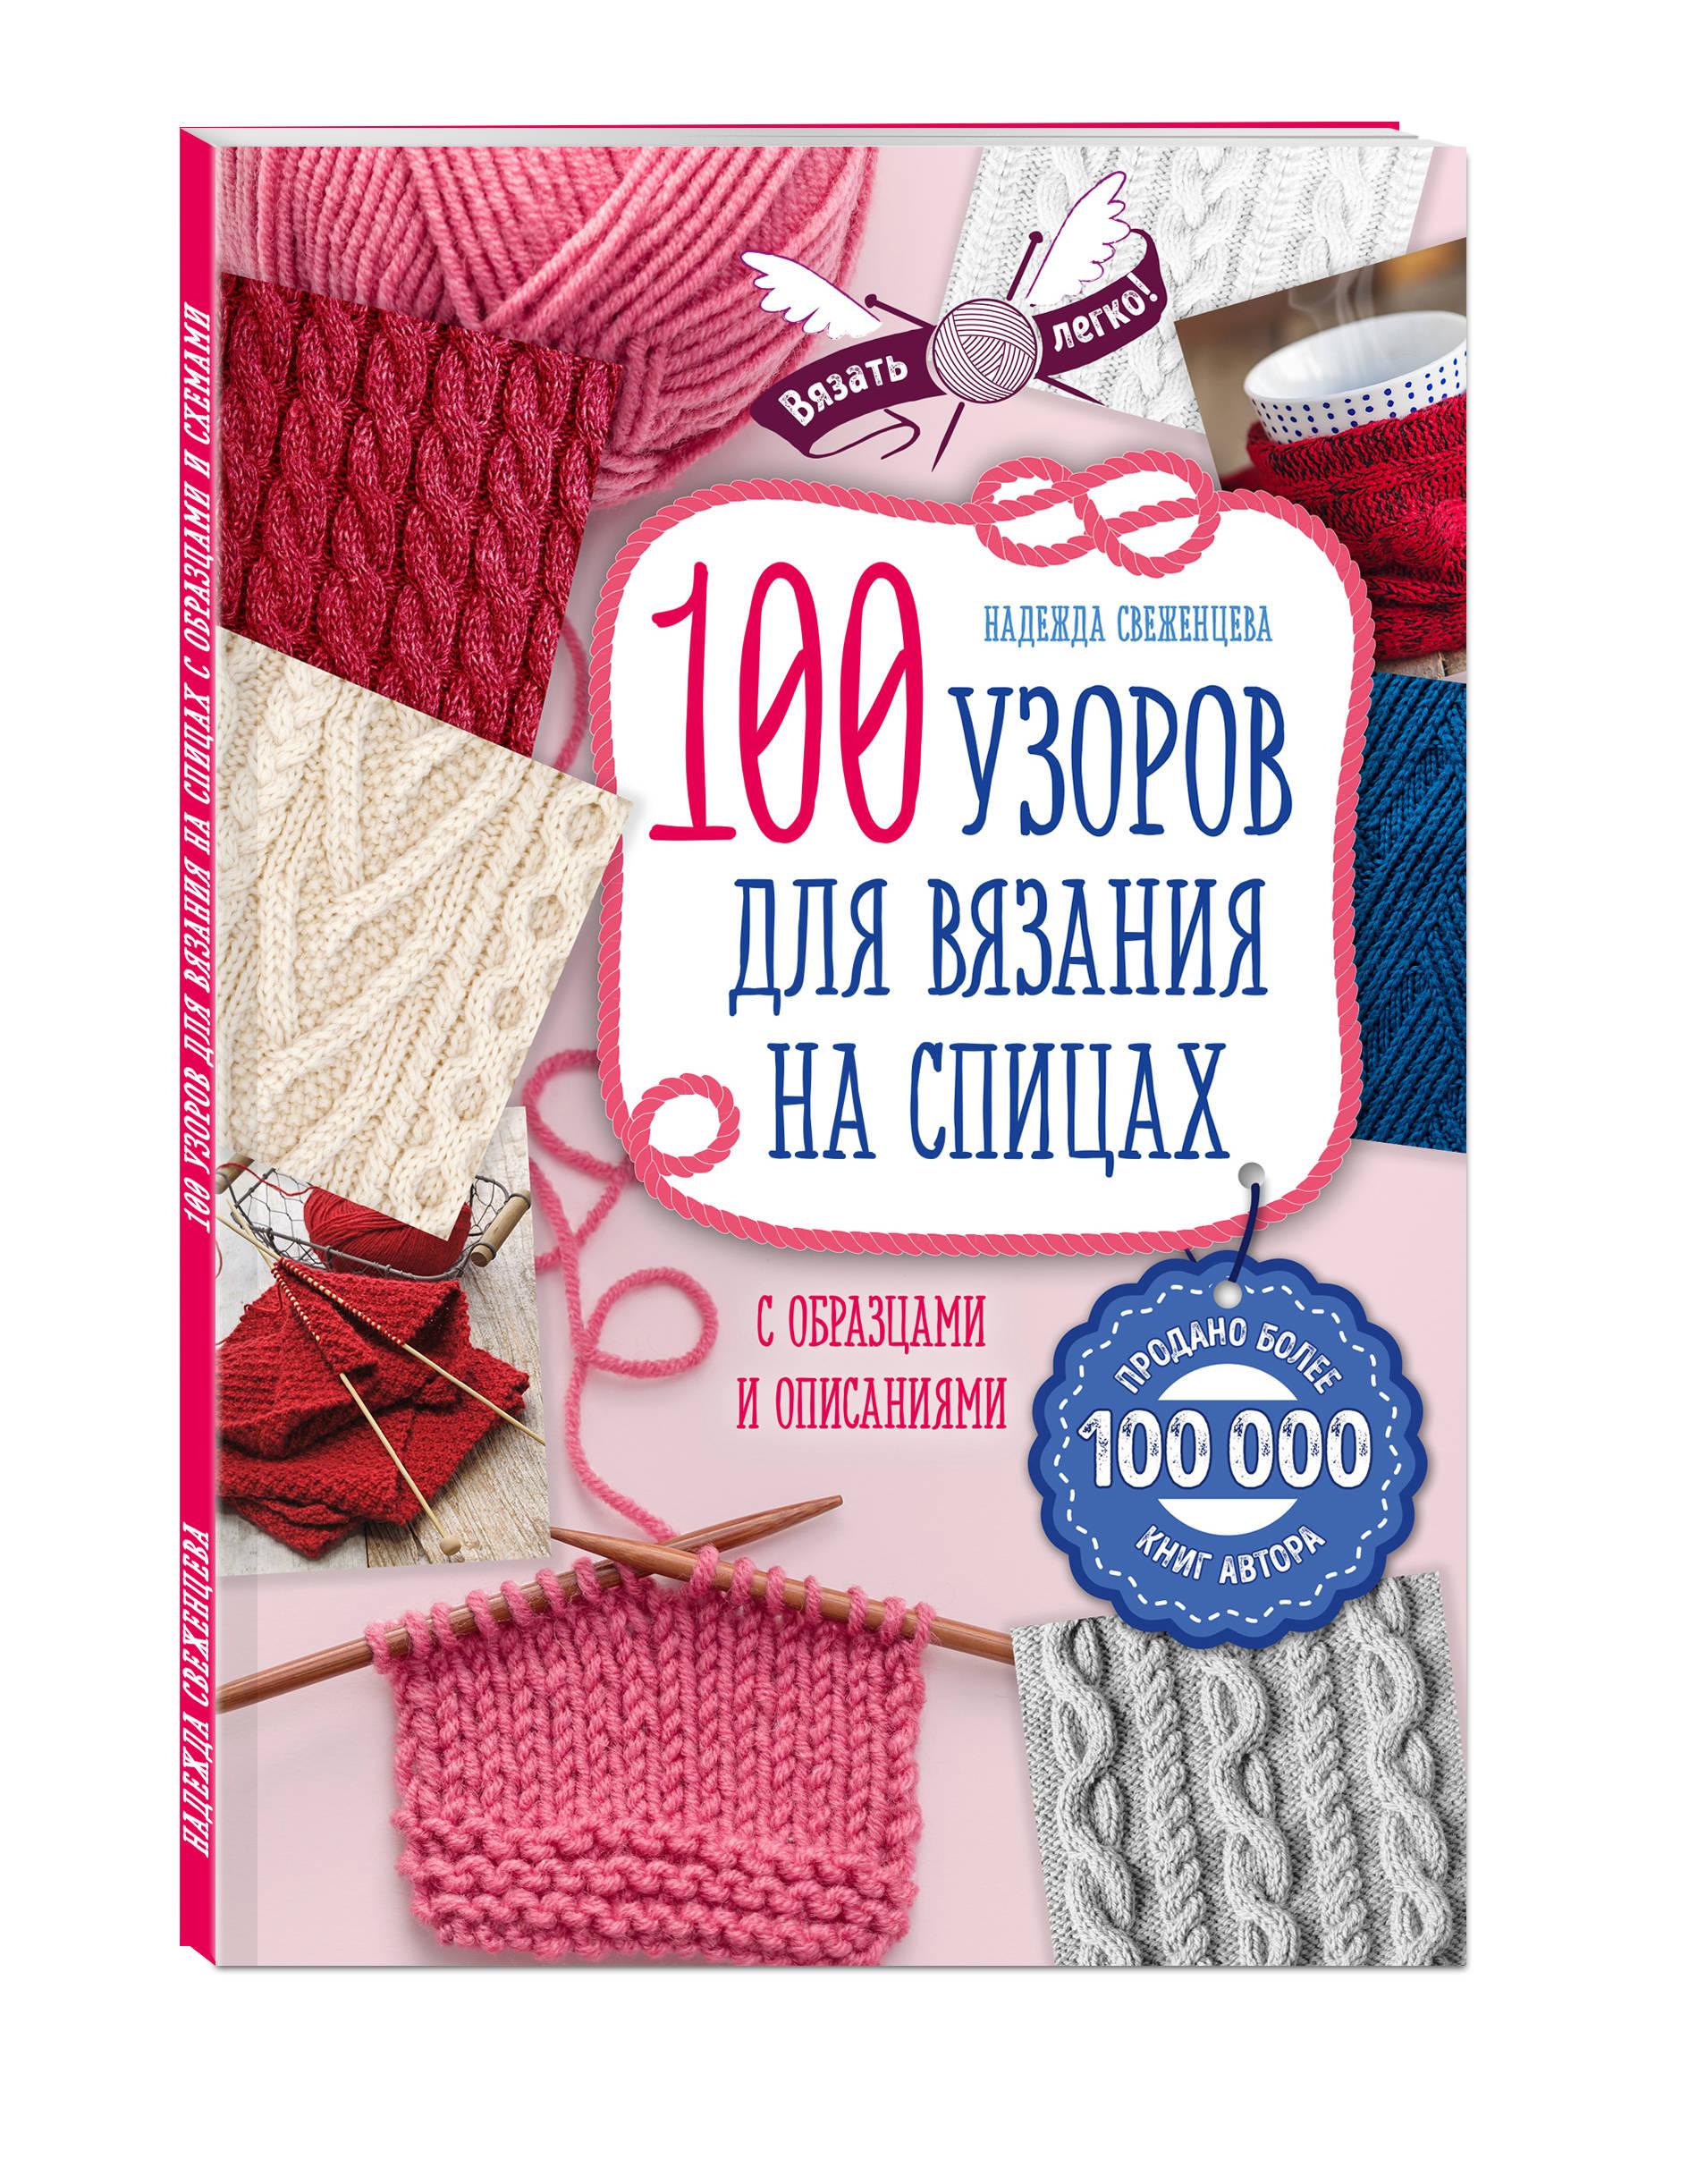 Надежда Свеженцева 100 узоров для вязания на спицах свеженцева н а 100 узоров для вязания на спицах